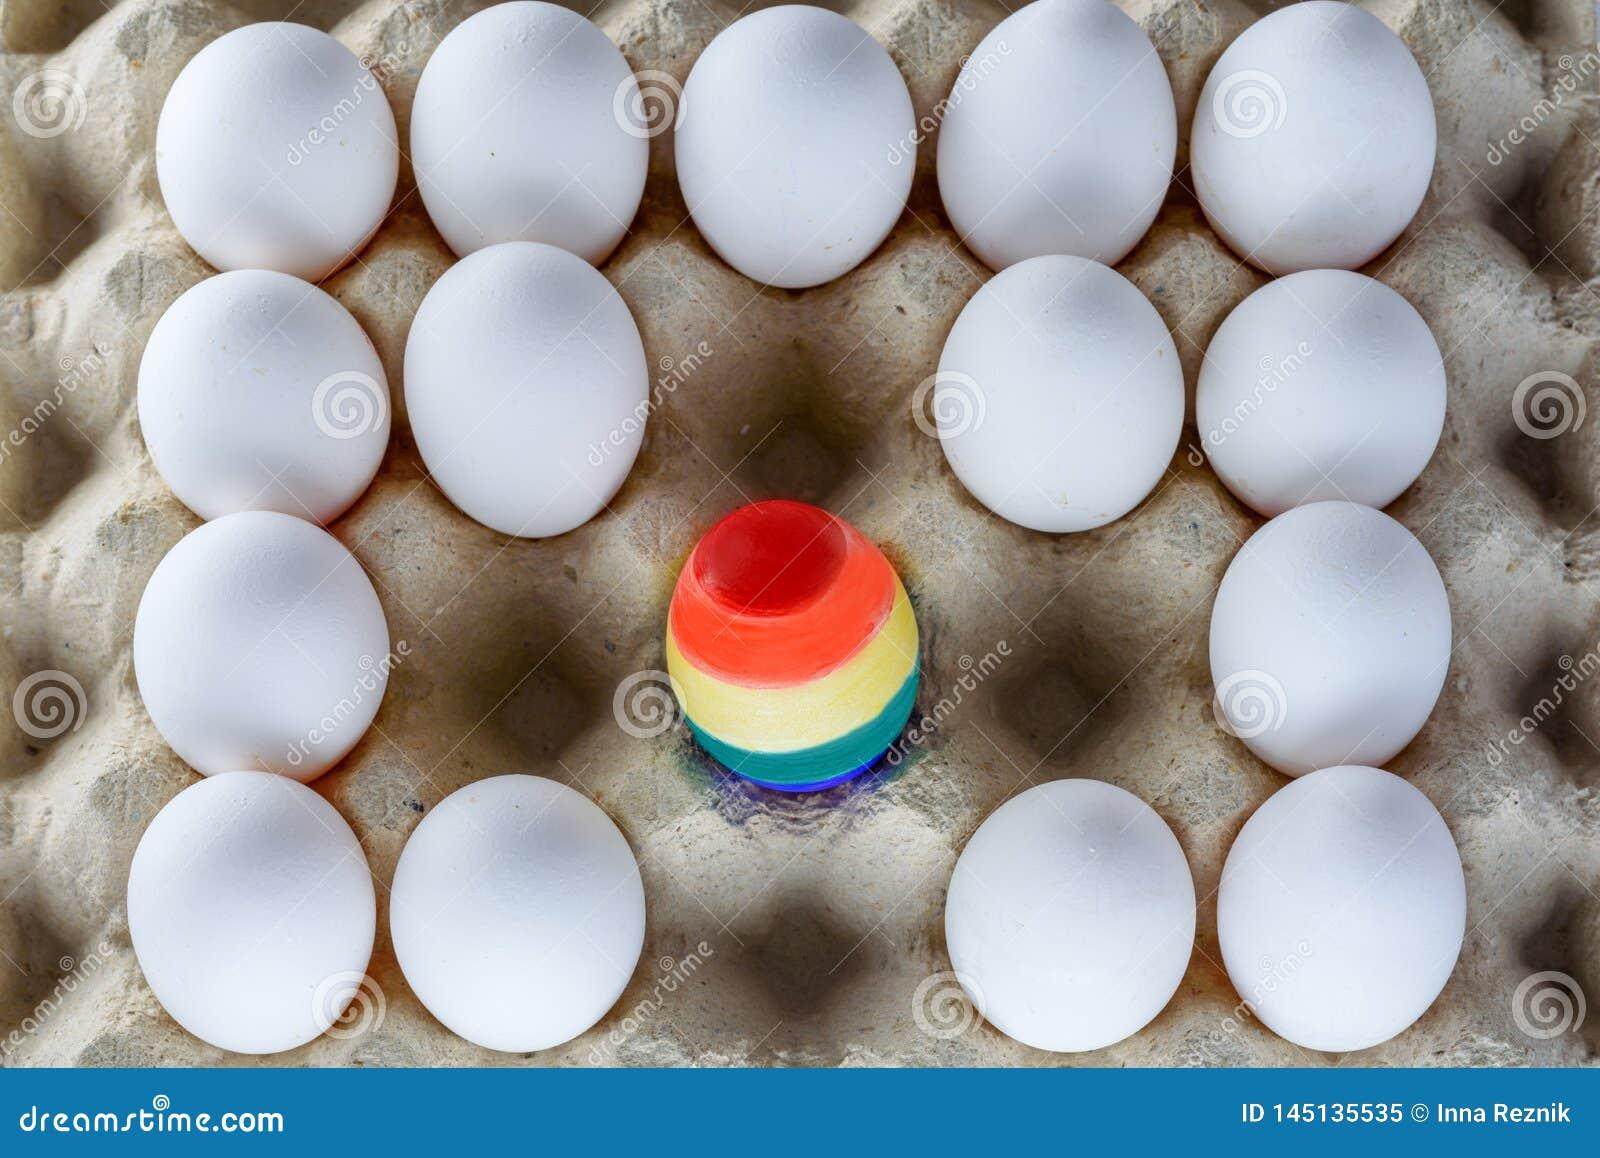 E 自豪感月LGBT纠正女同性恋的快乐两性的变性 r